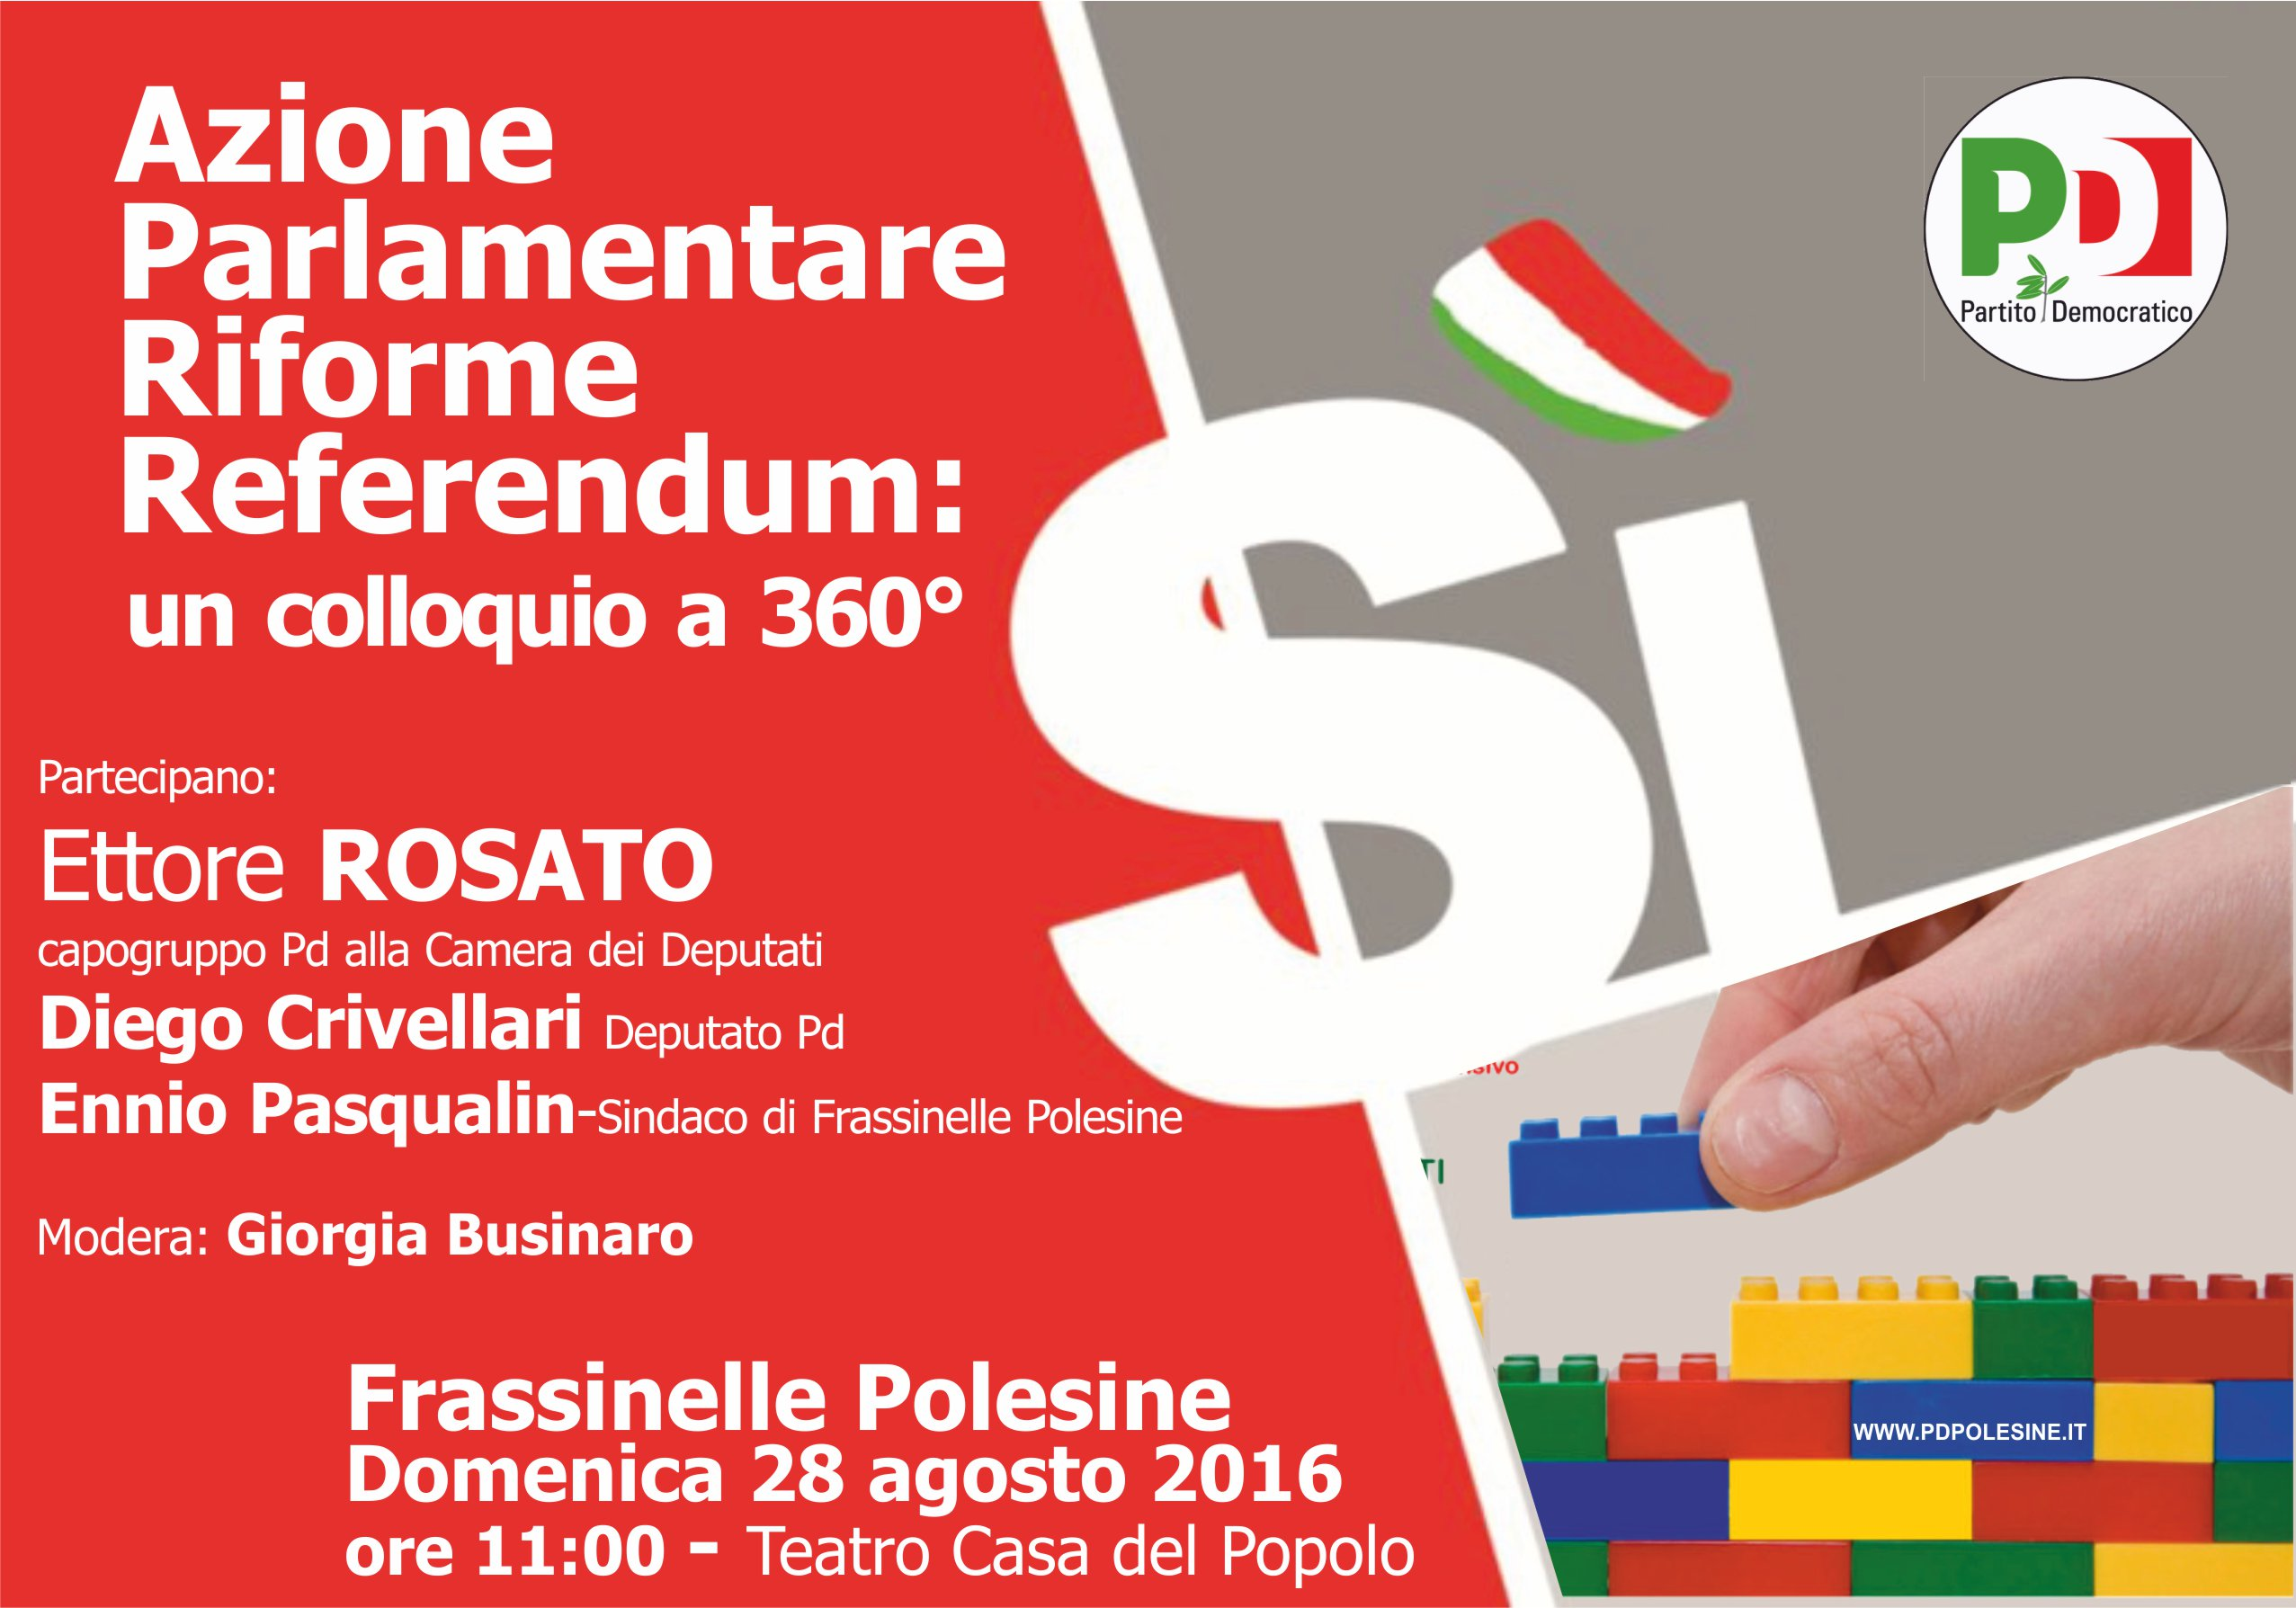 Frassinelle Polesine iniziativa con Ettore Rosato